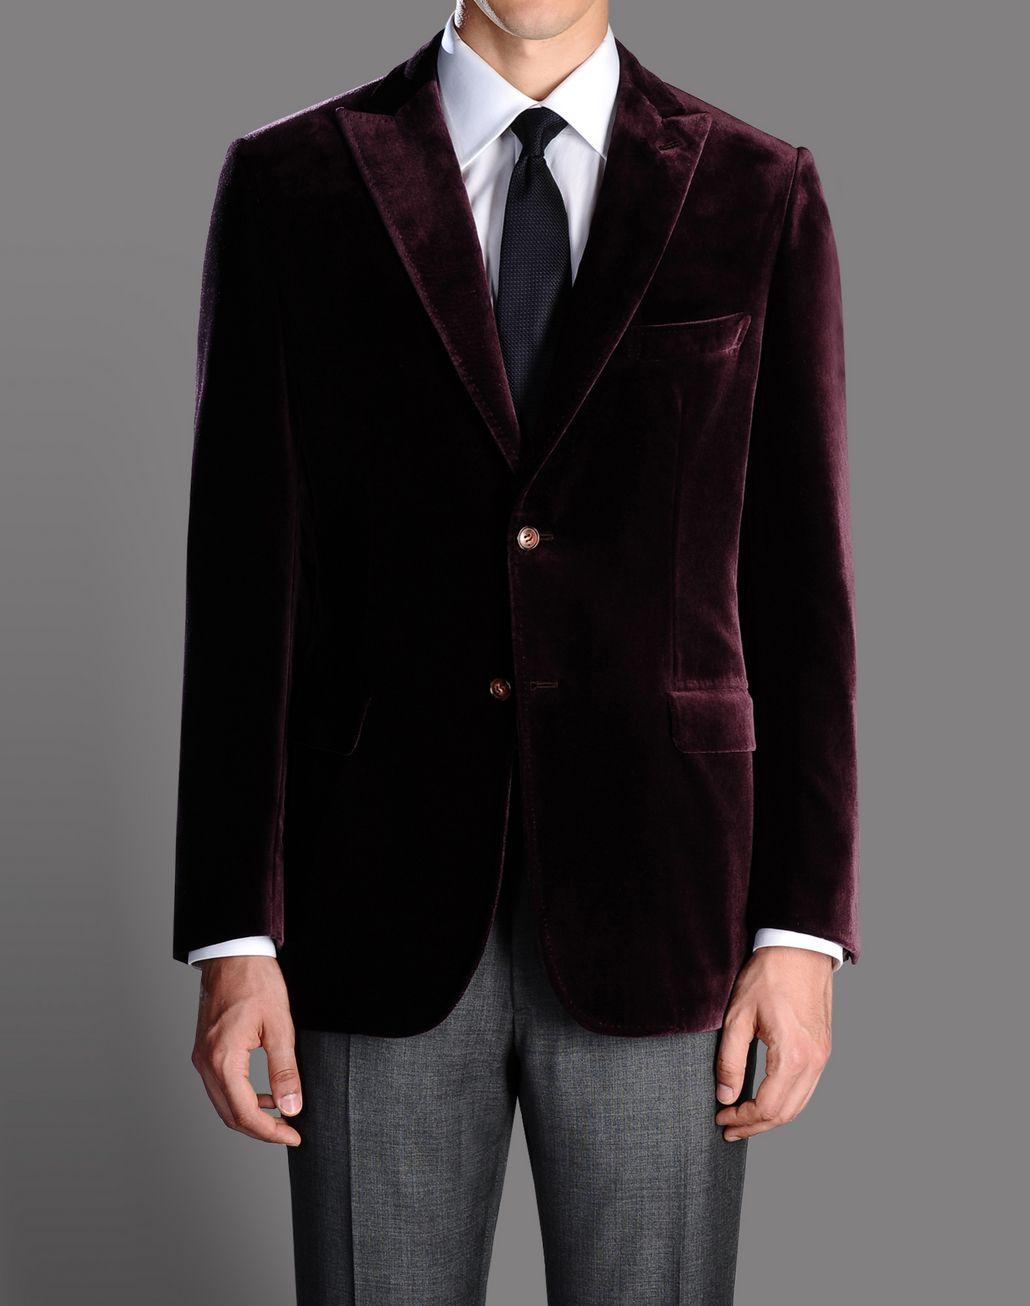 BRIONI burgundy velvet jacket with peaked lapels Suits & Jackets U f